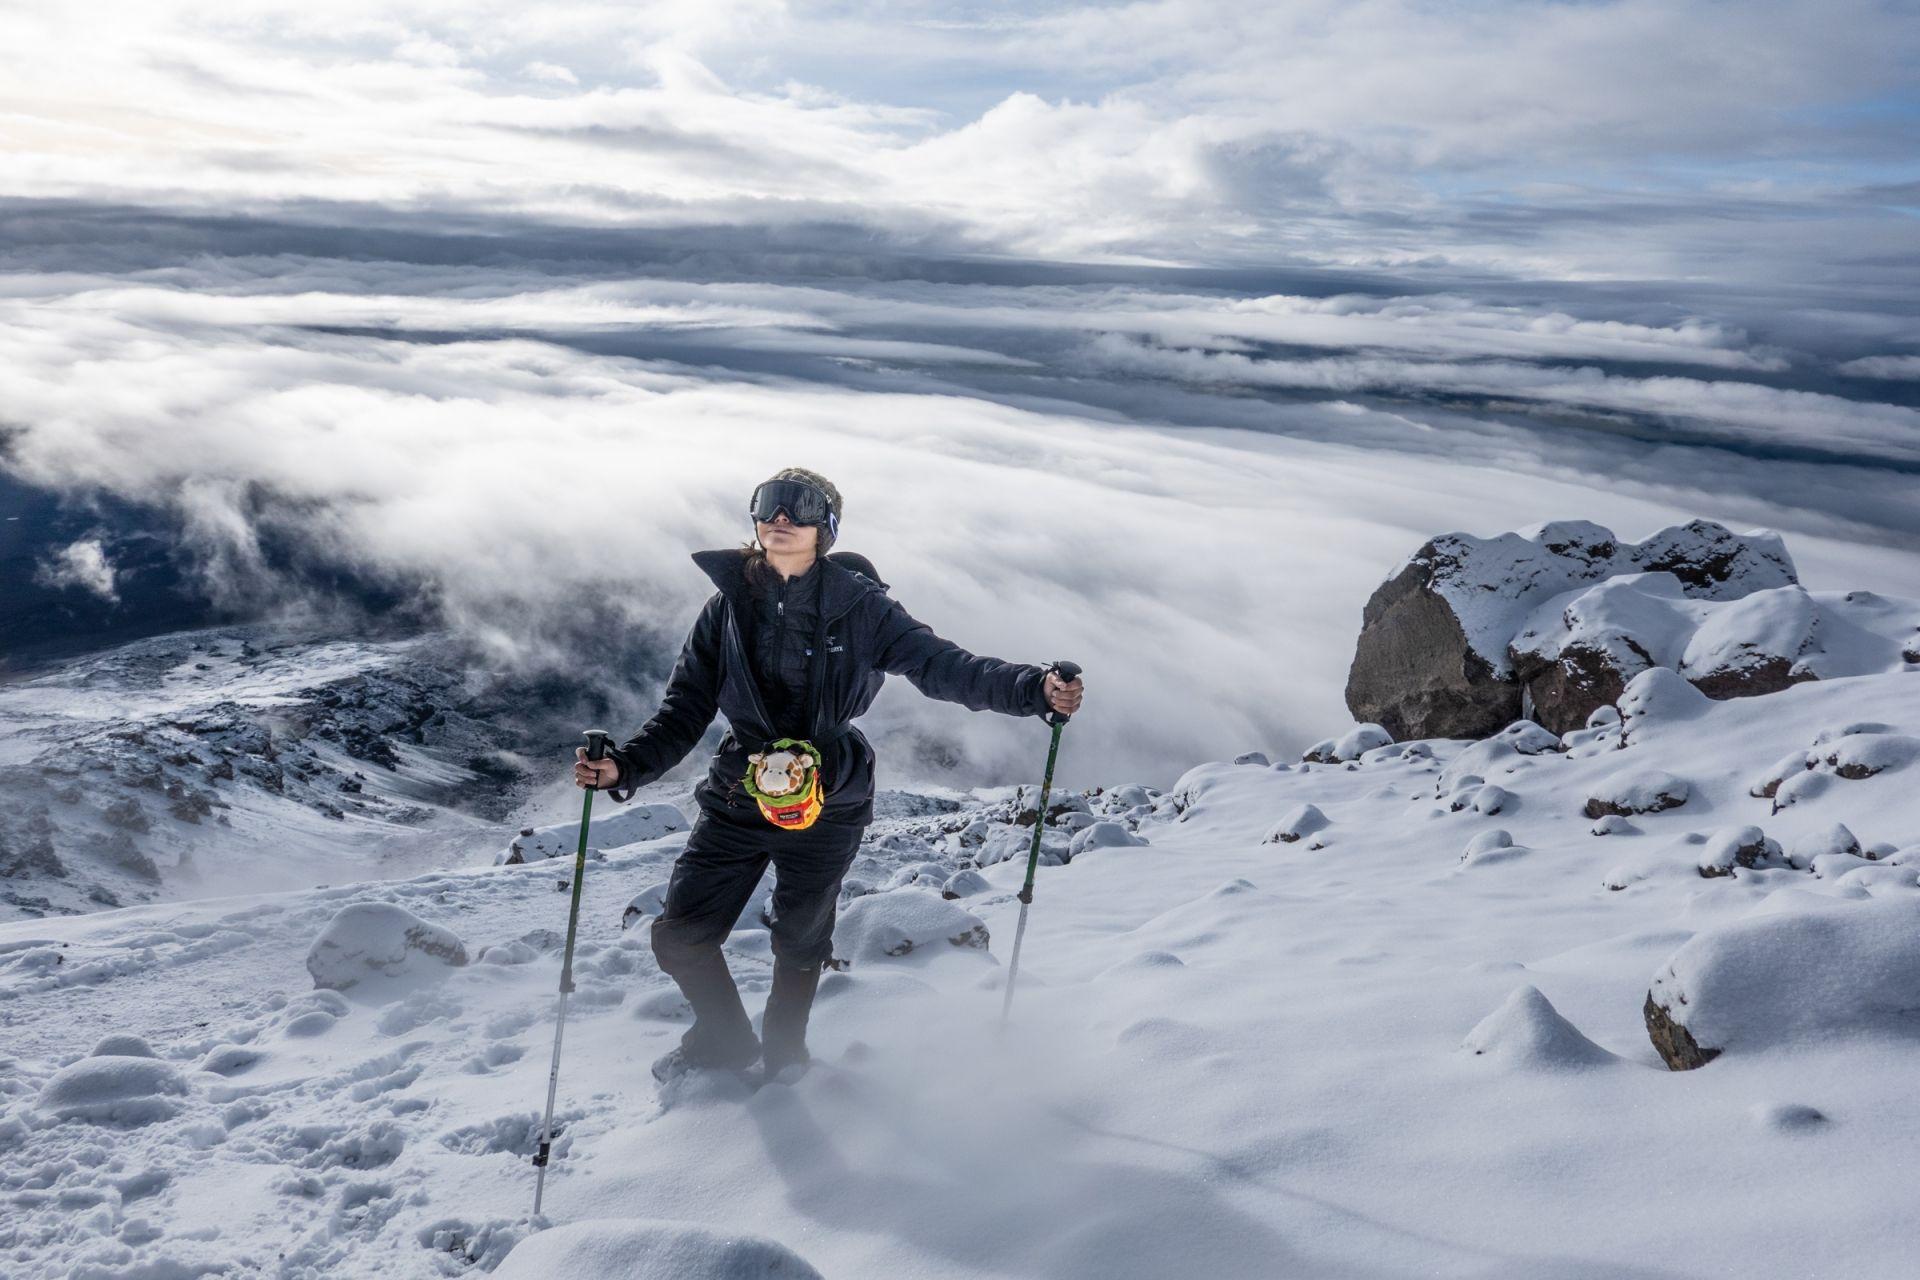 Katrina Razon Climbs Mount Kilimanjaro To Protect The Environment With Project C: Change